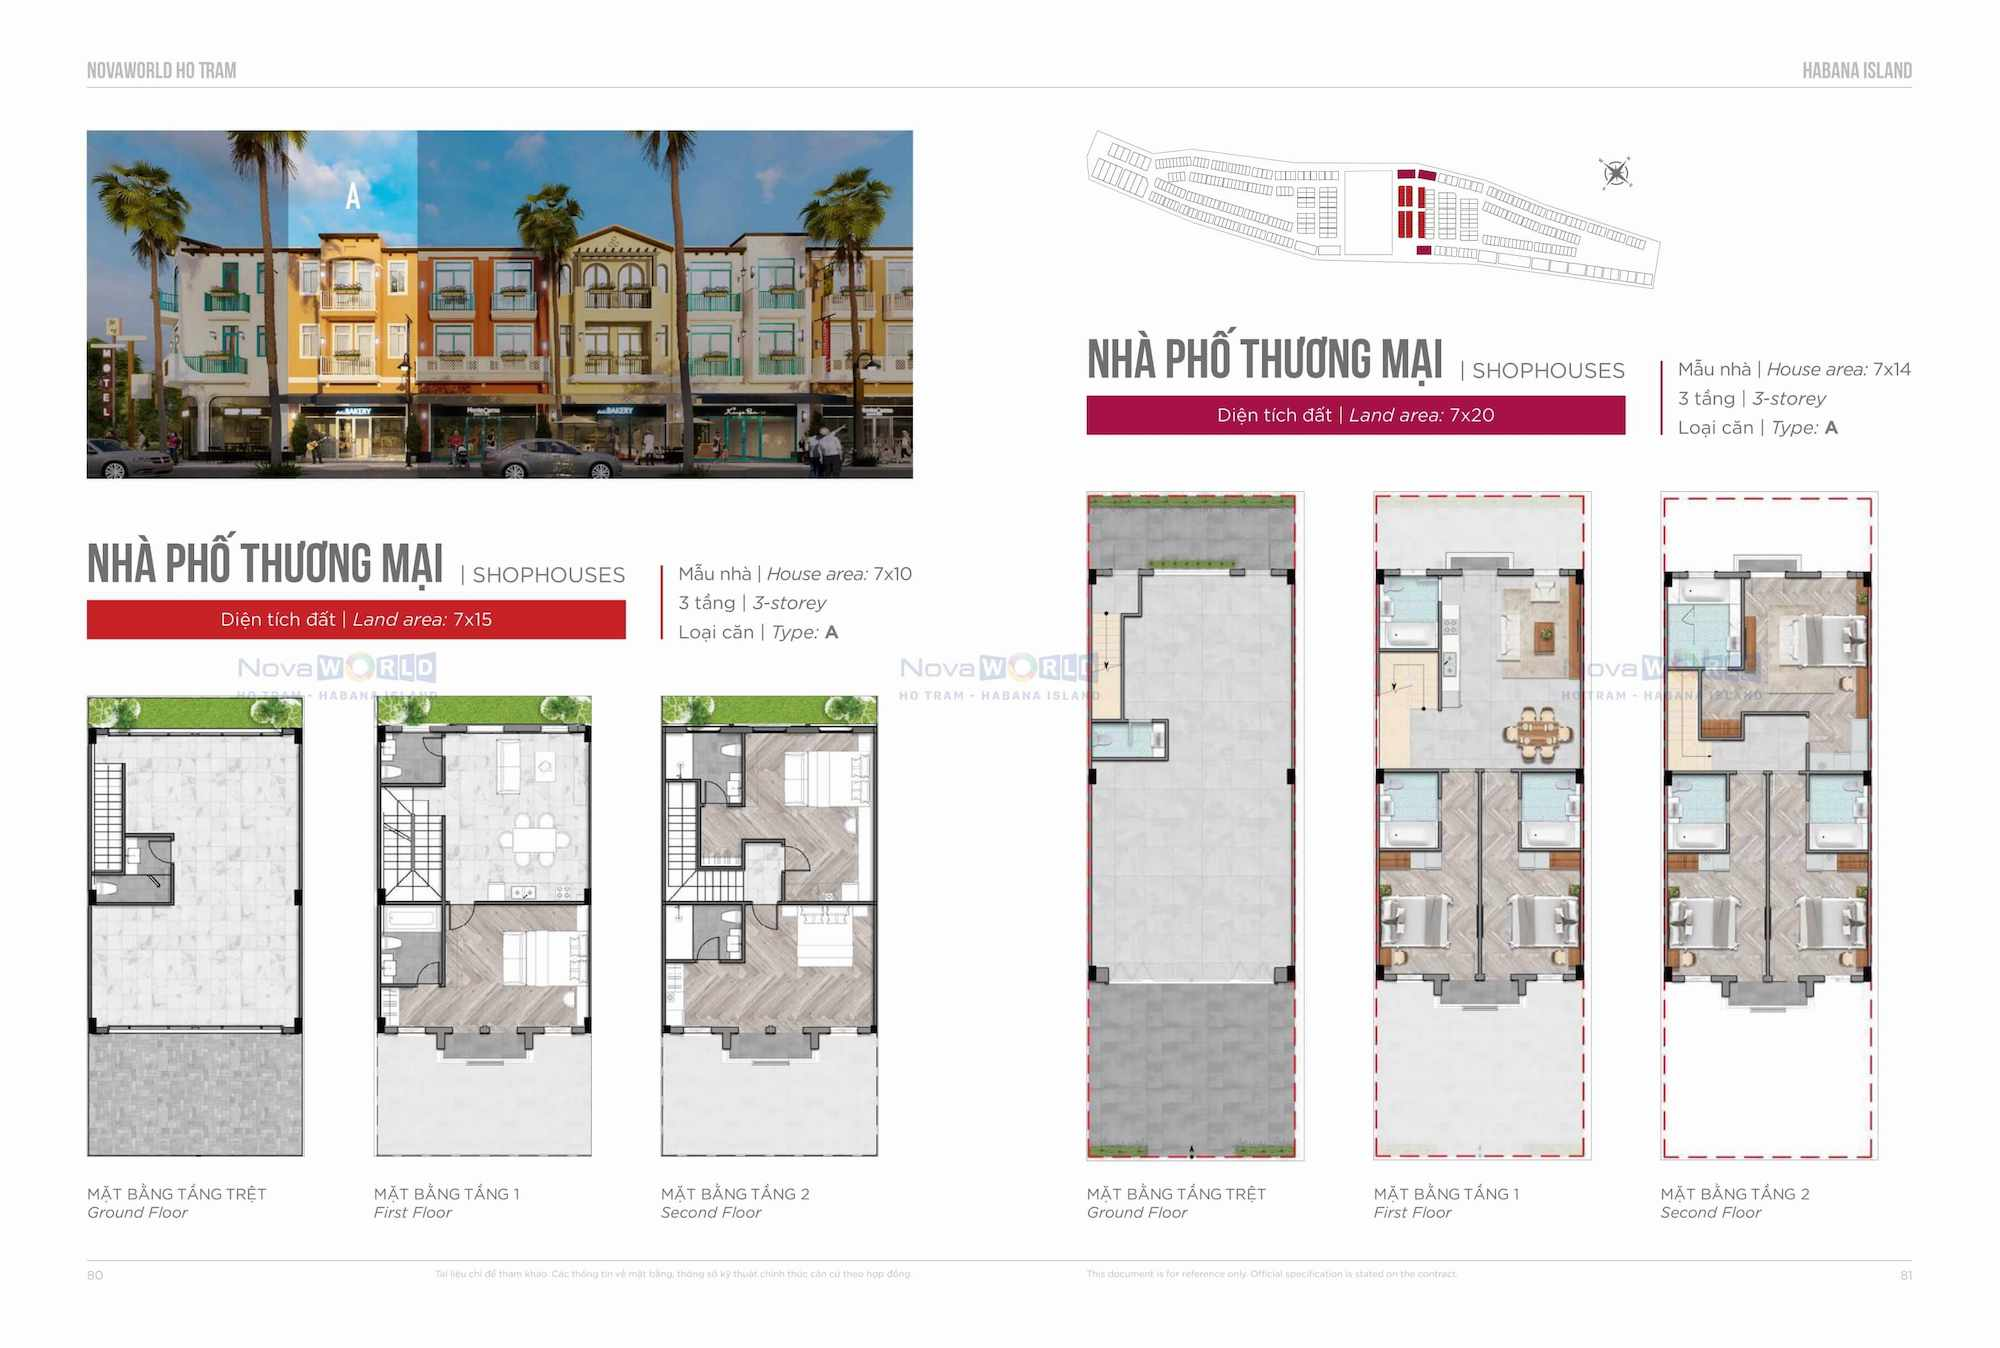 Thiết kế Shophouse Habana Island NovaWorld Ho Tram